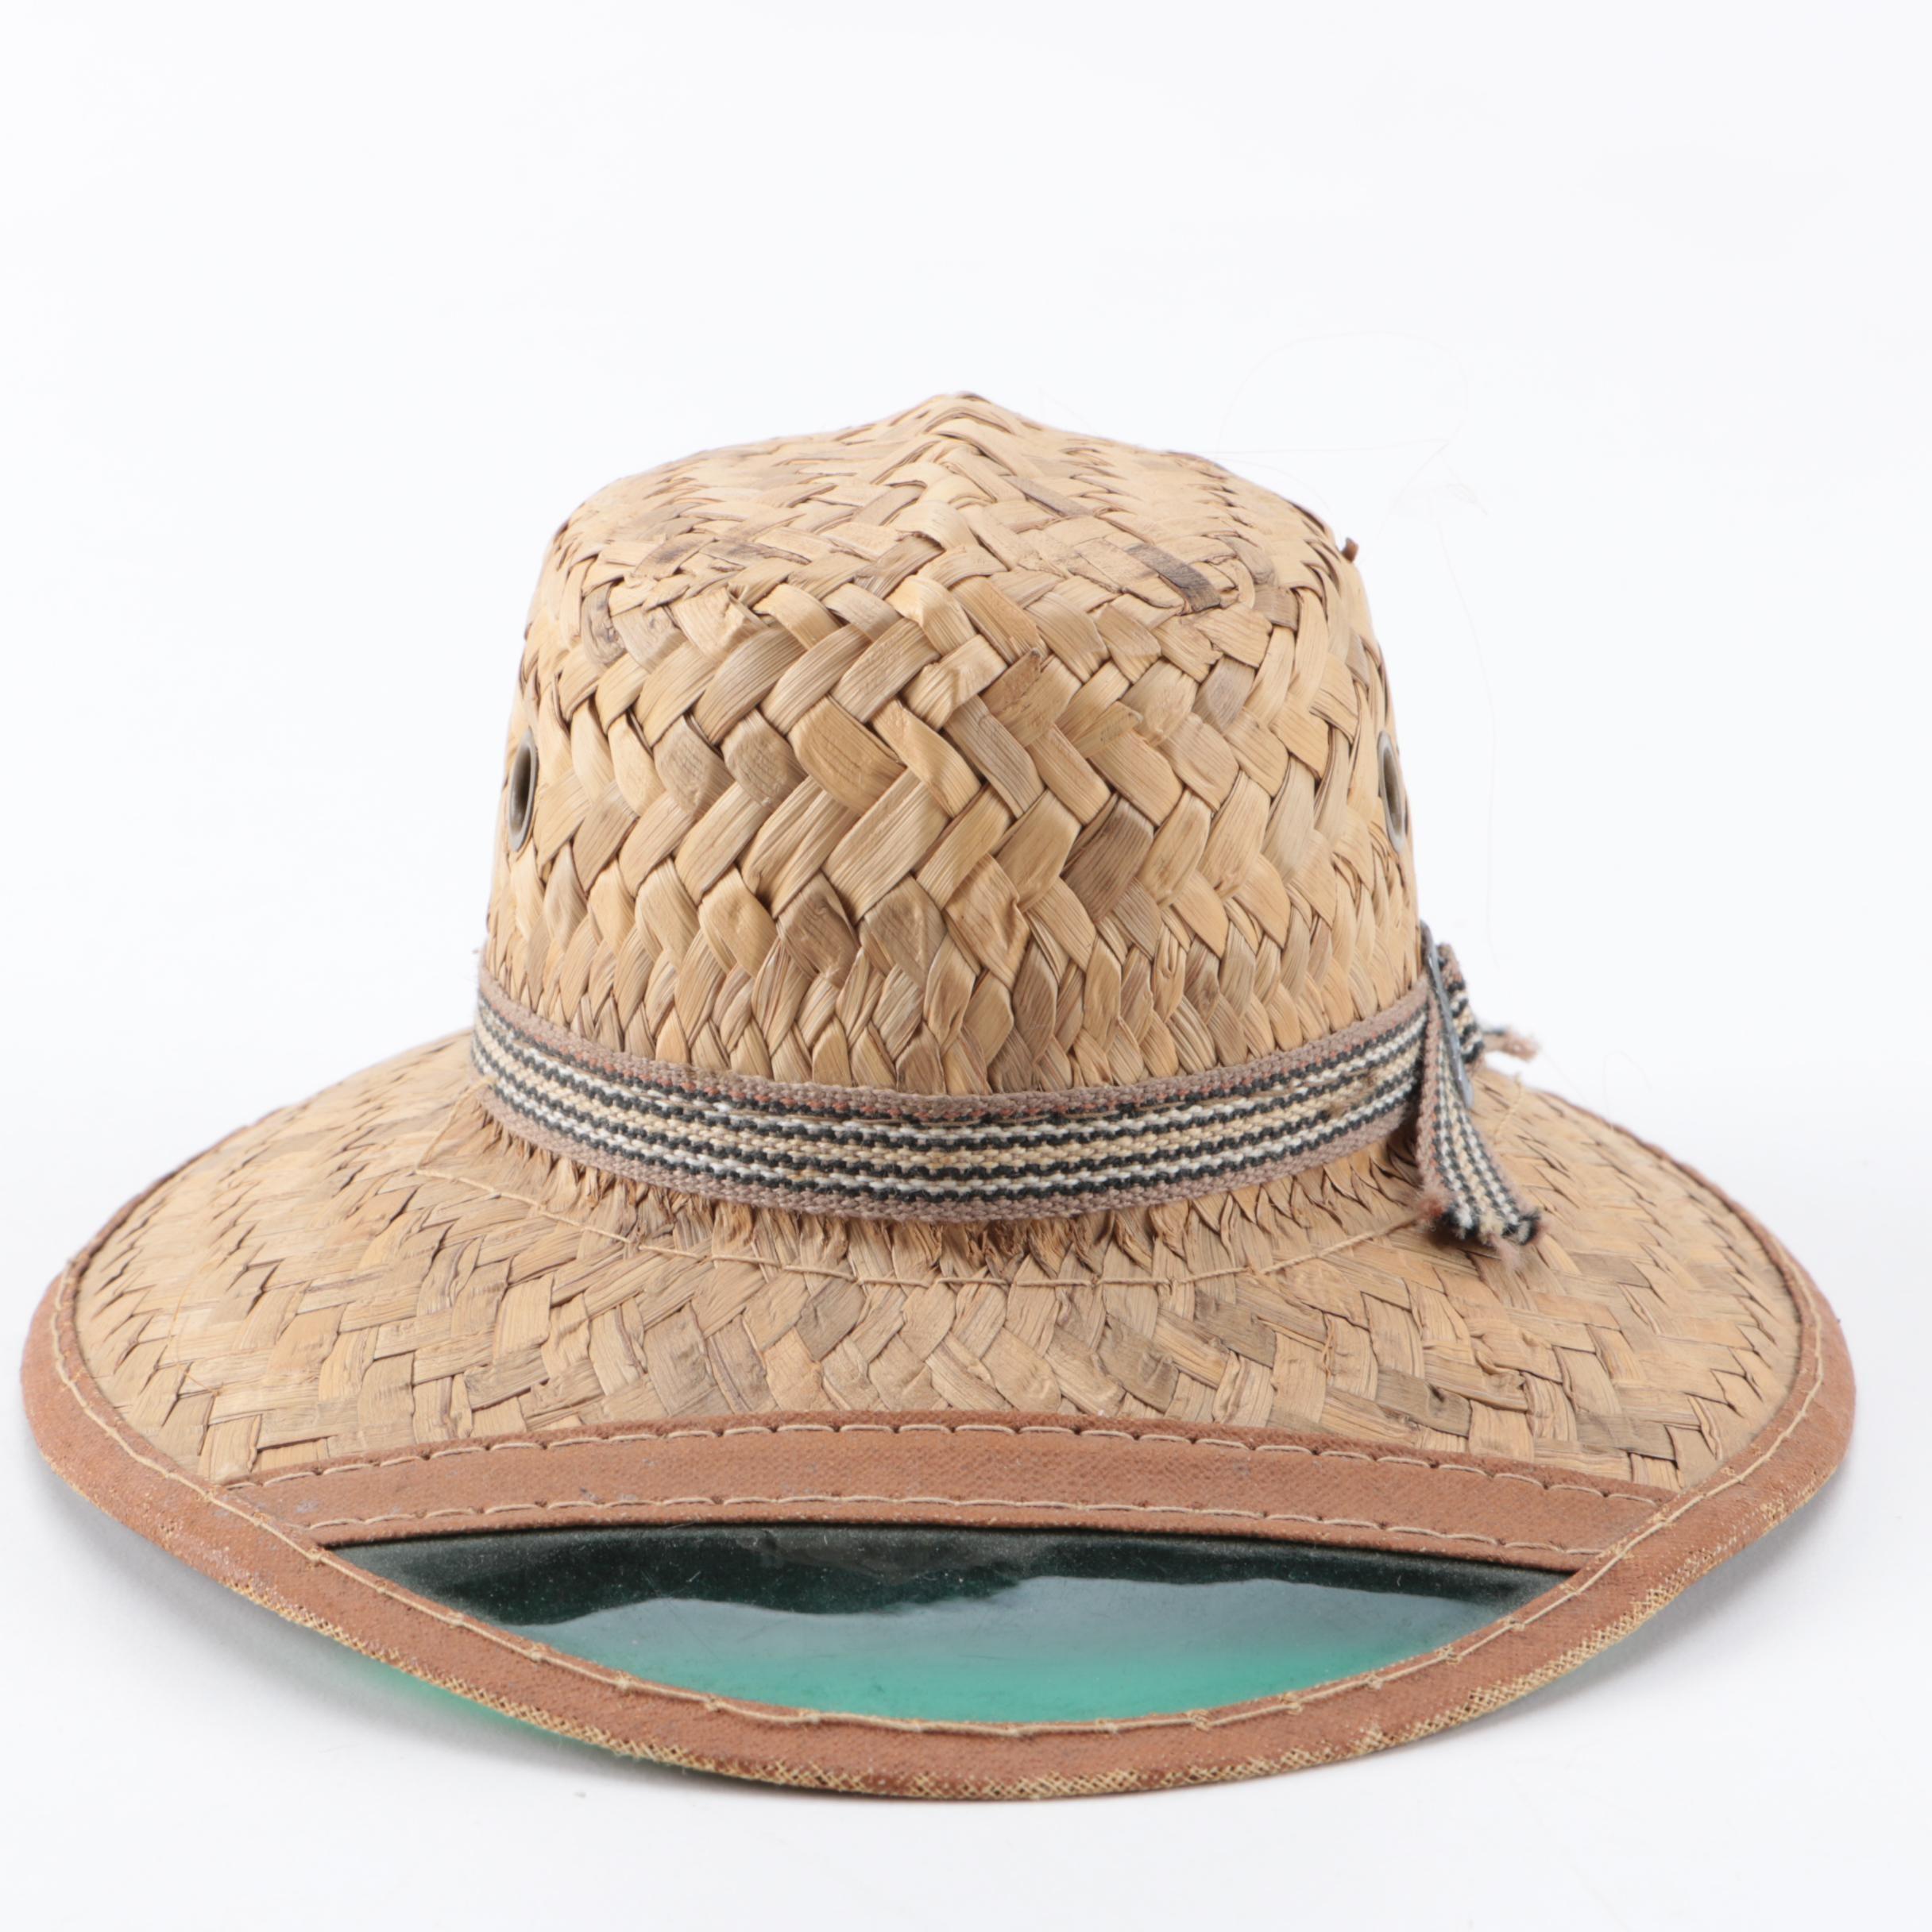 Western Hemisphere Miniature Straw Hat